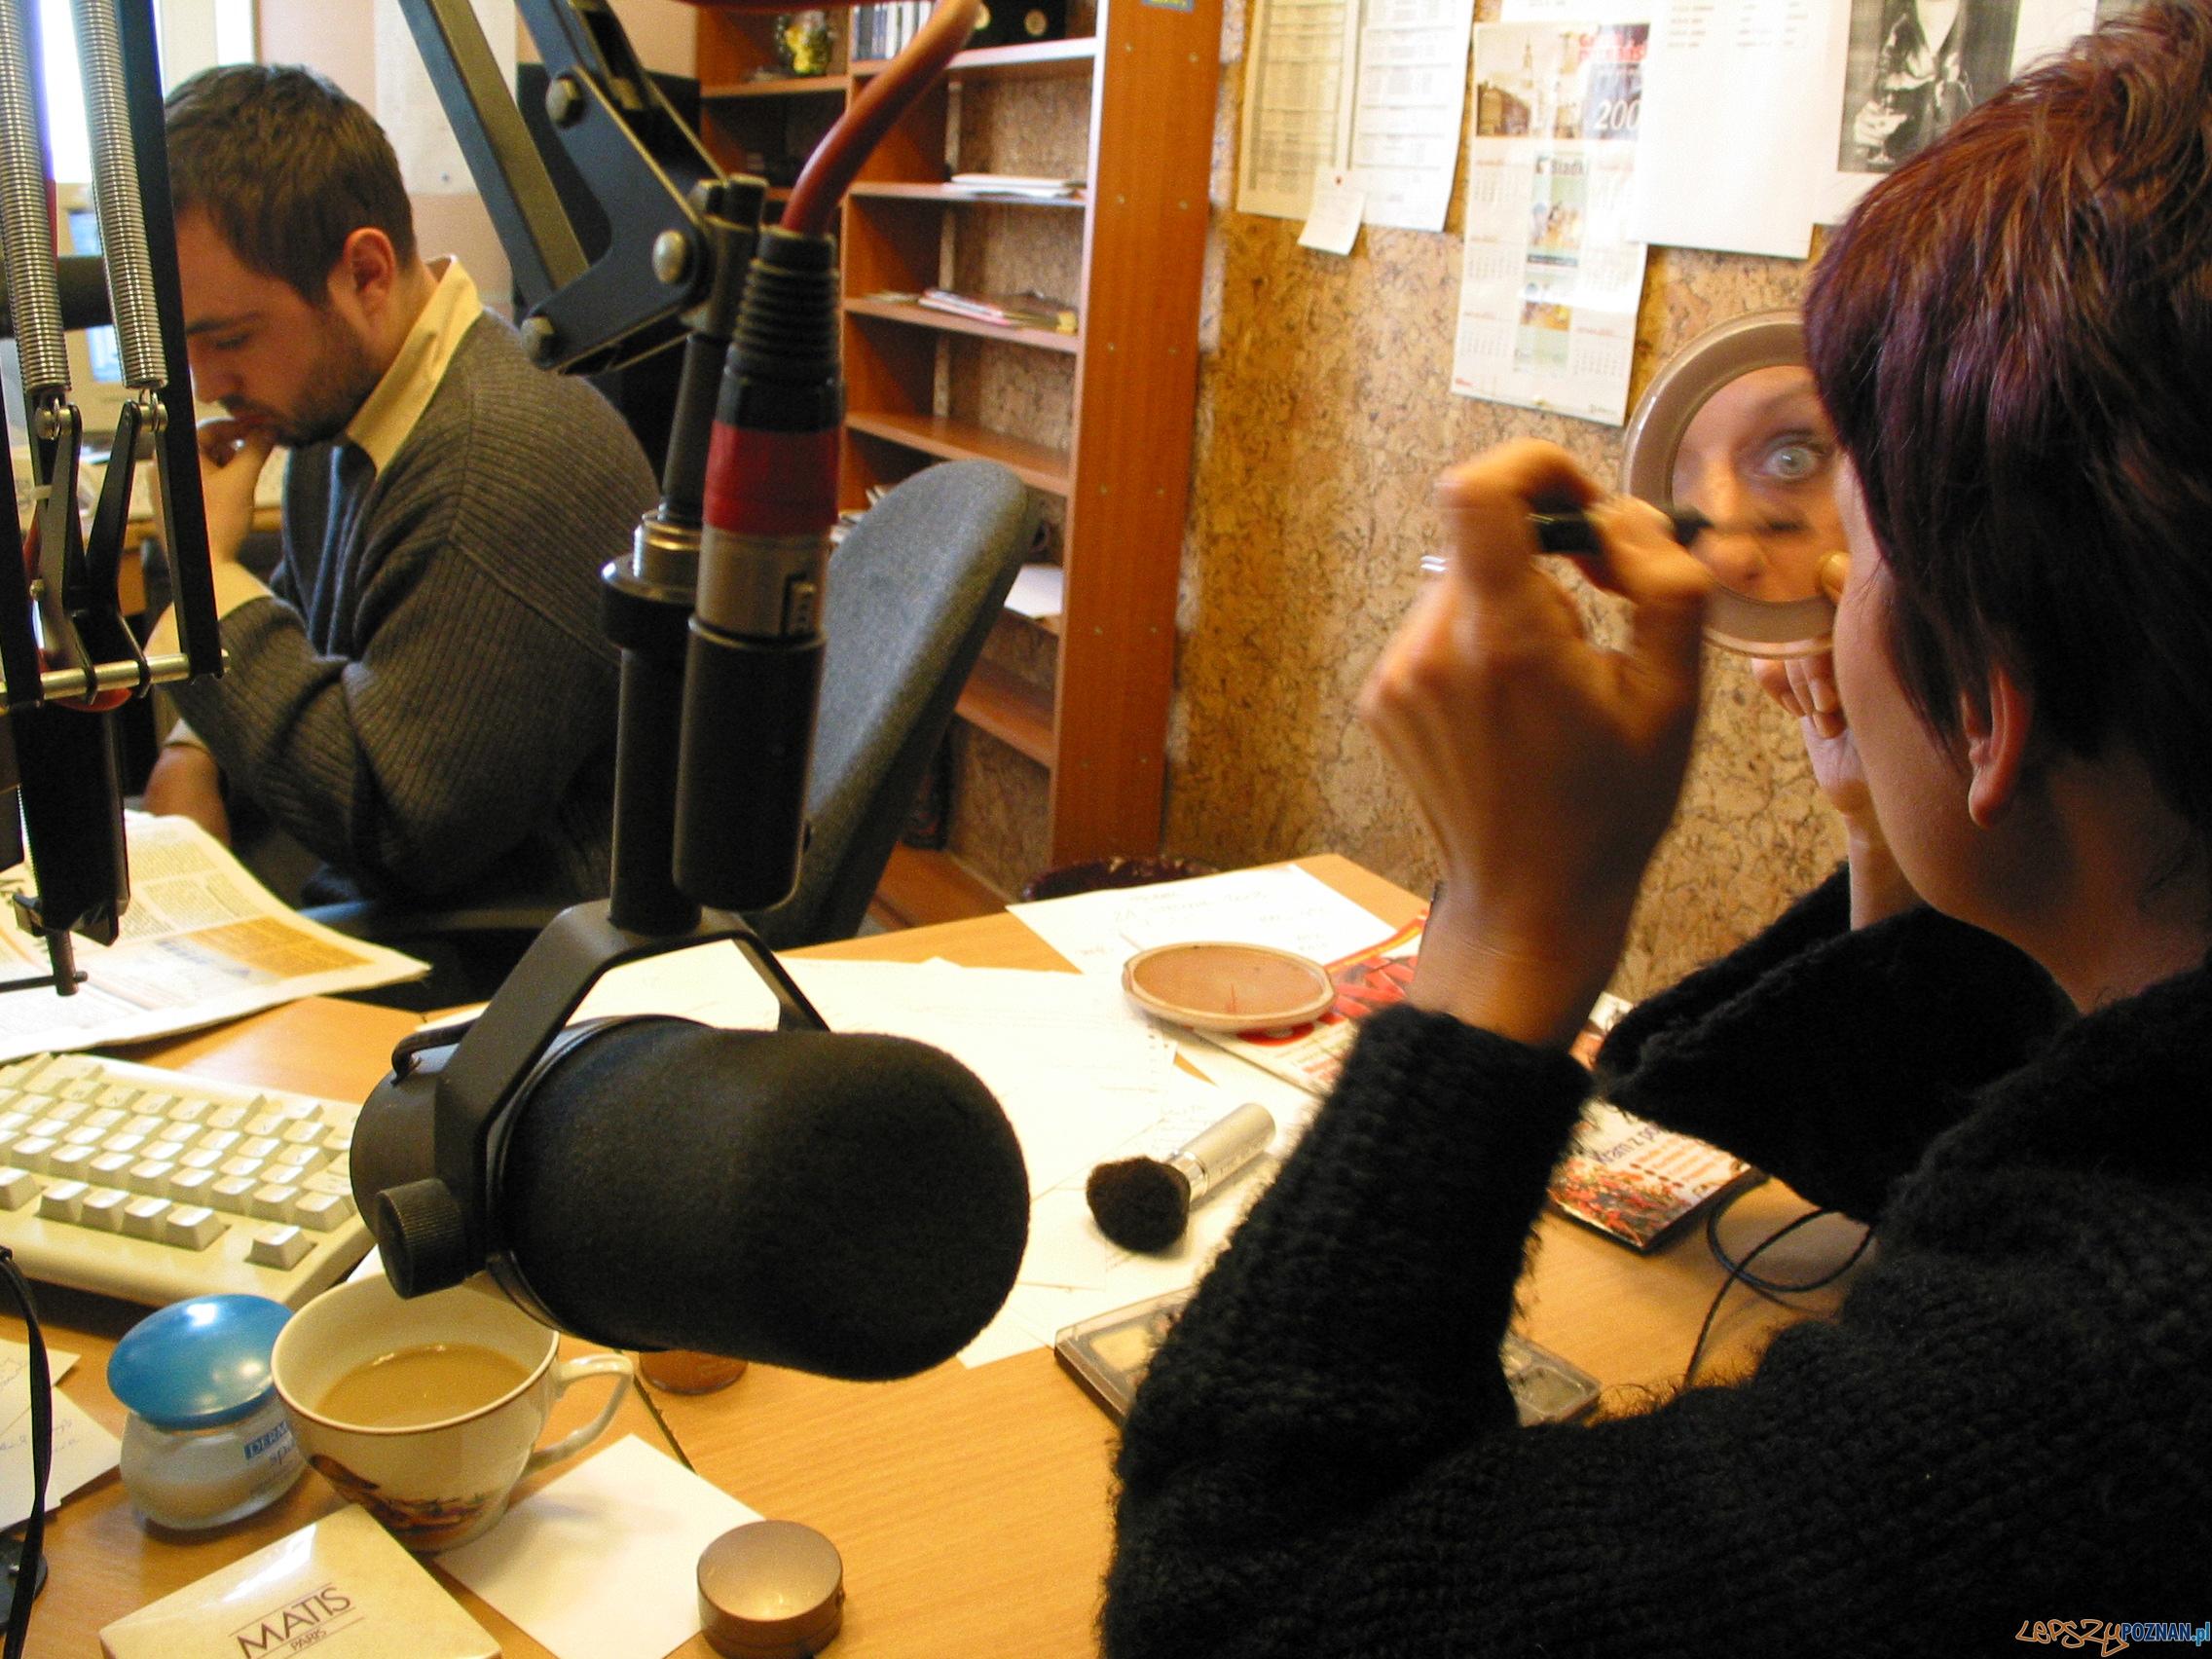 Studio radiowe  Foto: foto-poznan